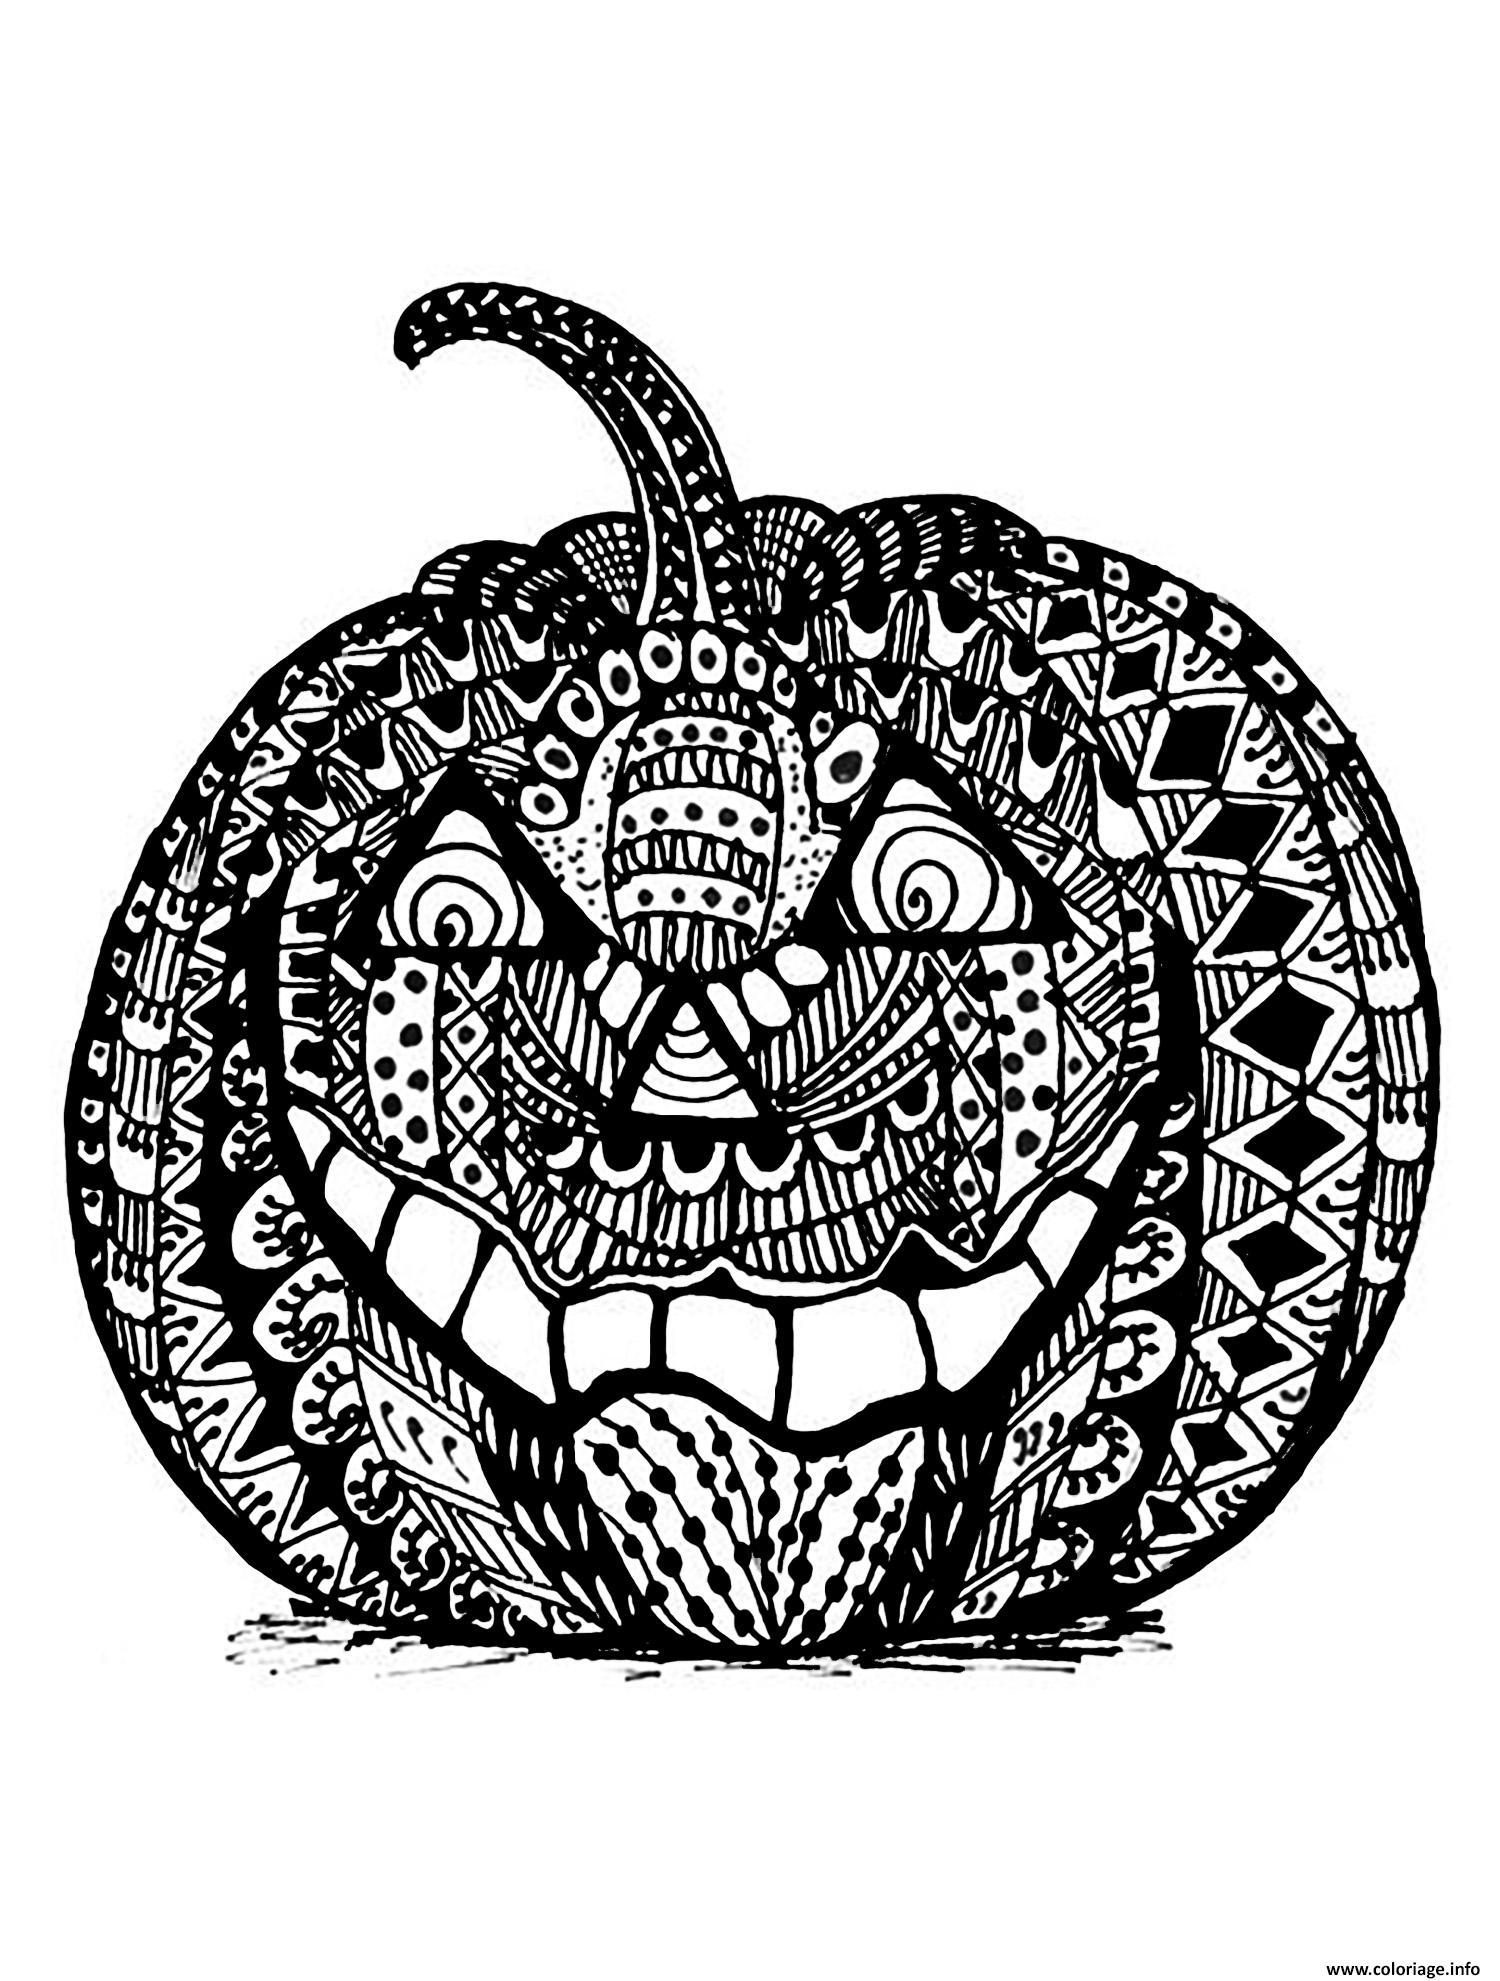 Impressionnant Dessin A Imprimer Citrouille Halloween